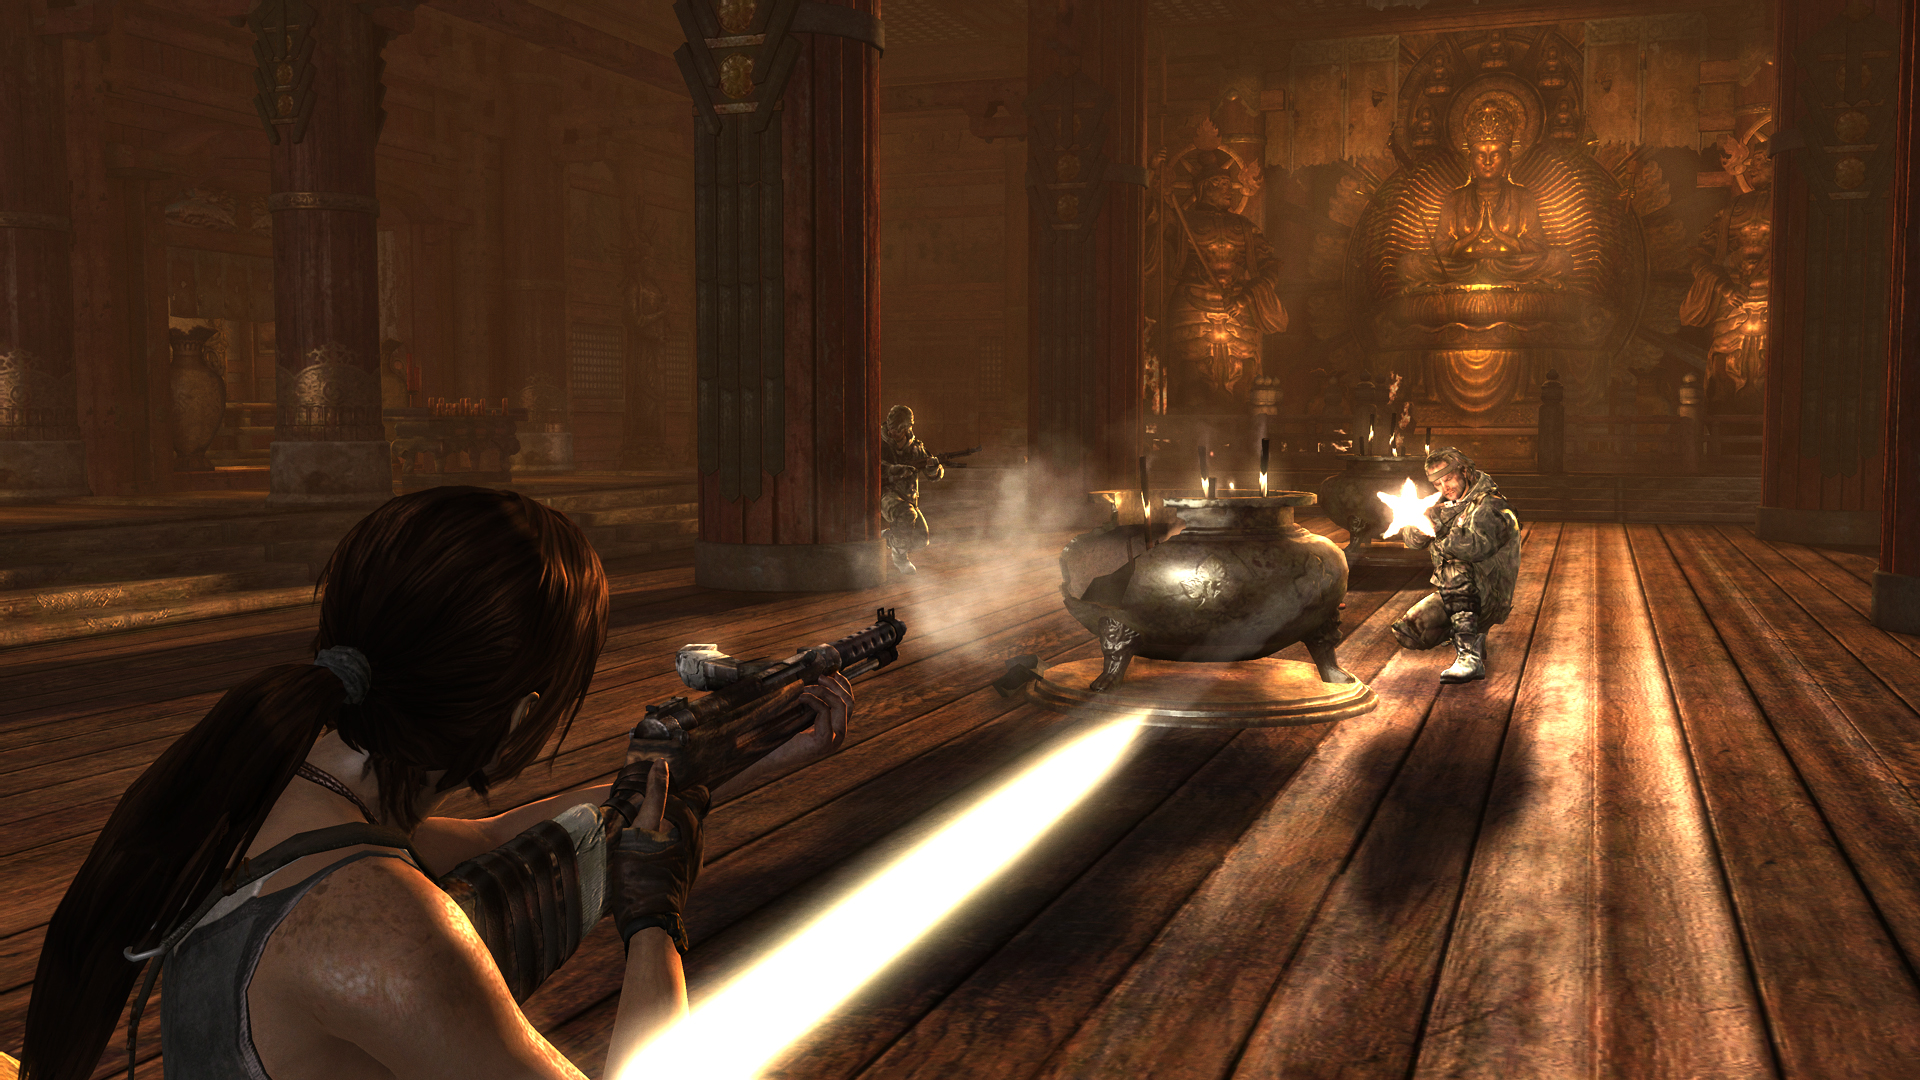 Tomb Raider Screenshots Explore Temple, Fight Samurai #25770